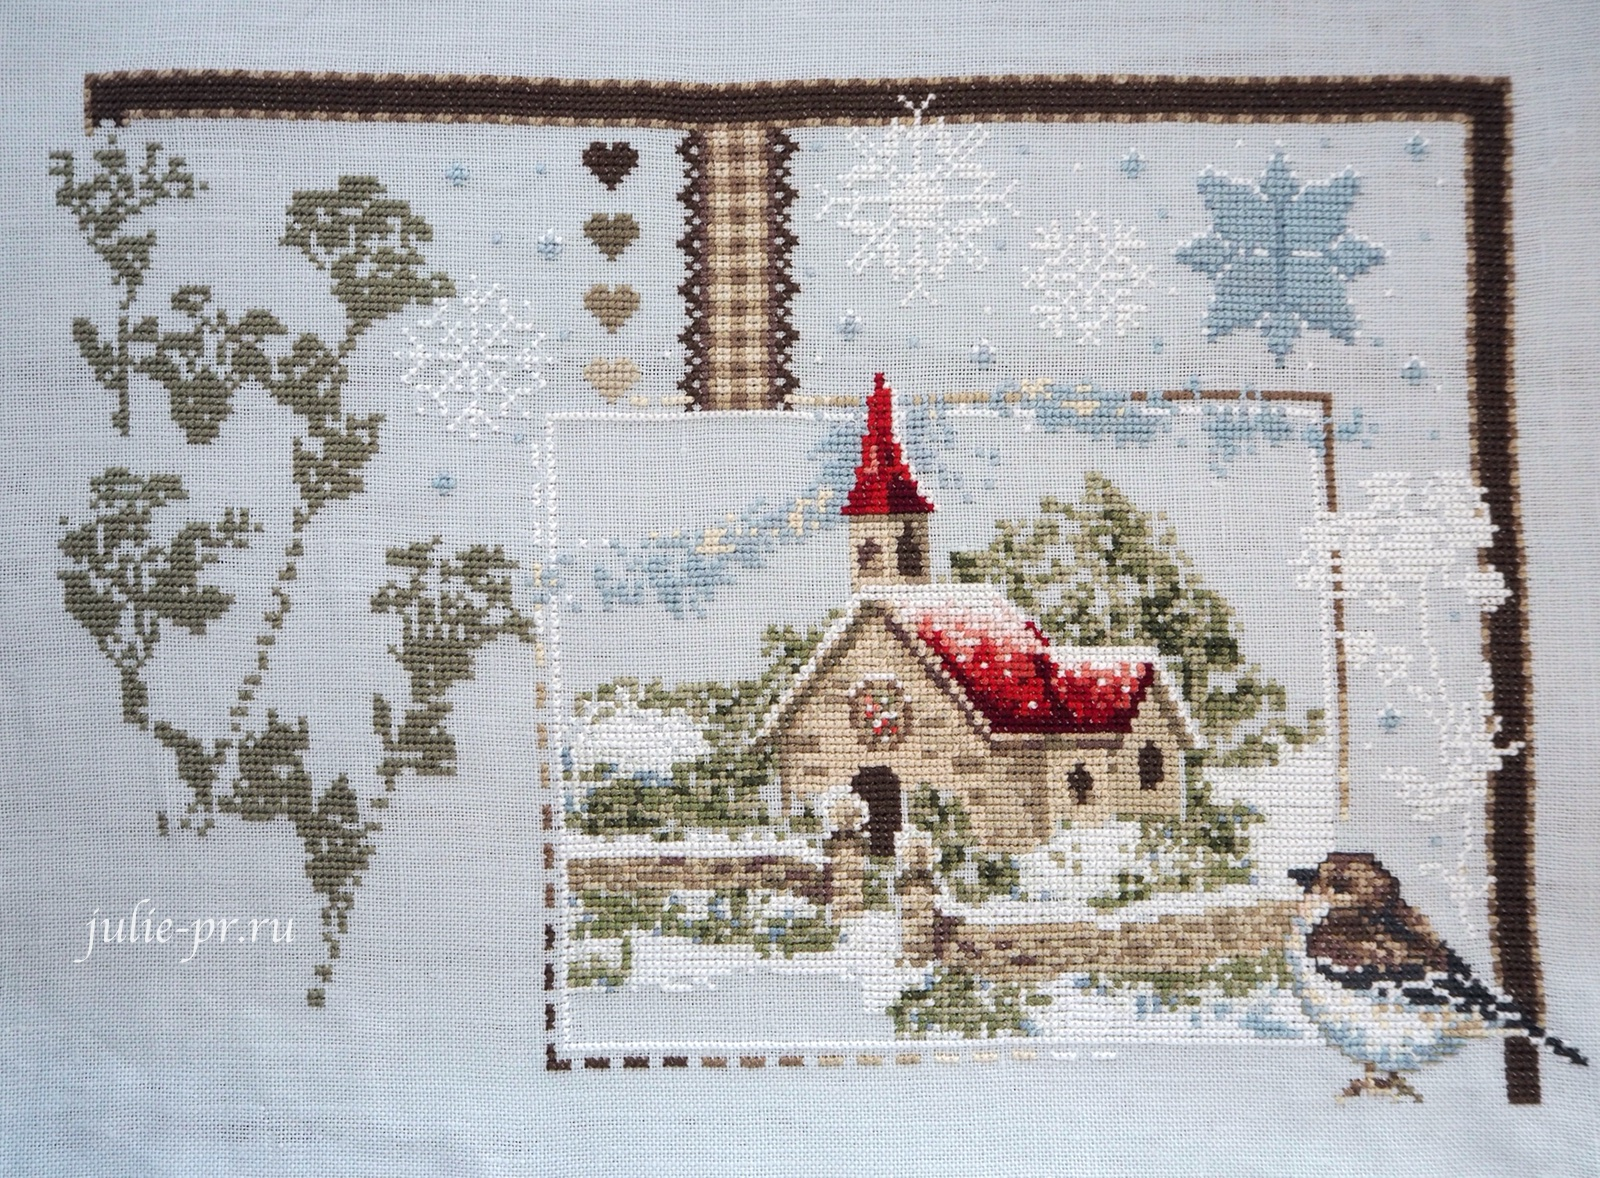 вышивка крестом, Madame la Fee, Le Village sous la Neige, Заснеженная деревня, французская вышивка, процесс вышивки